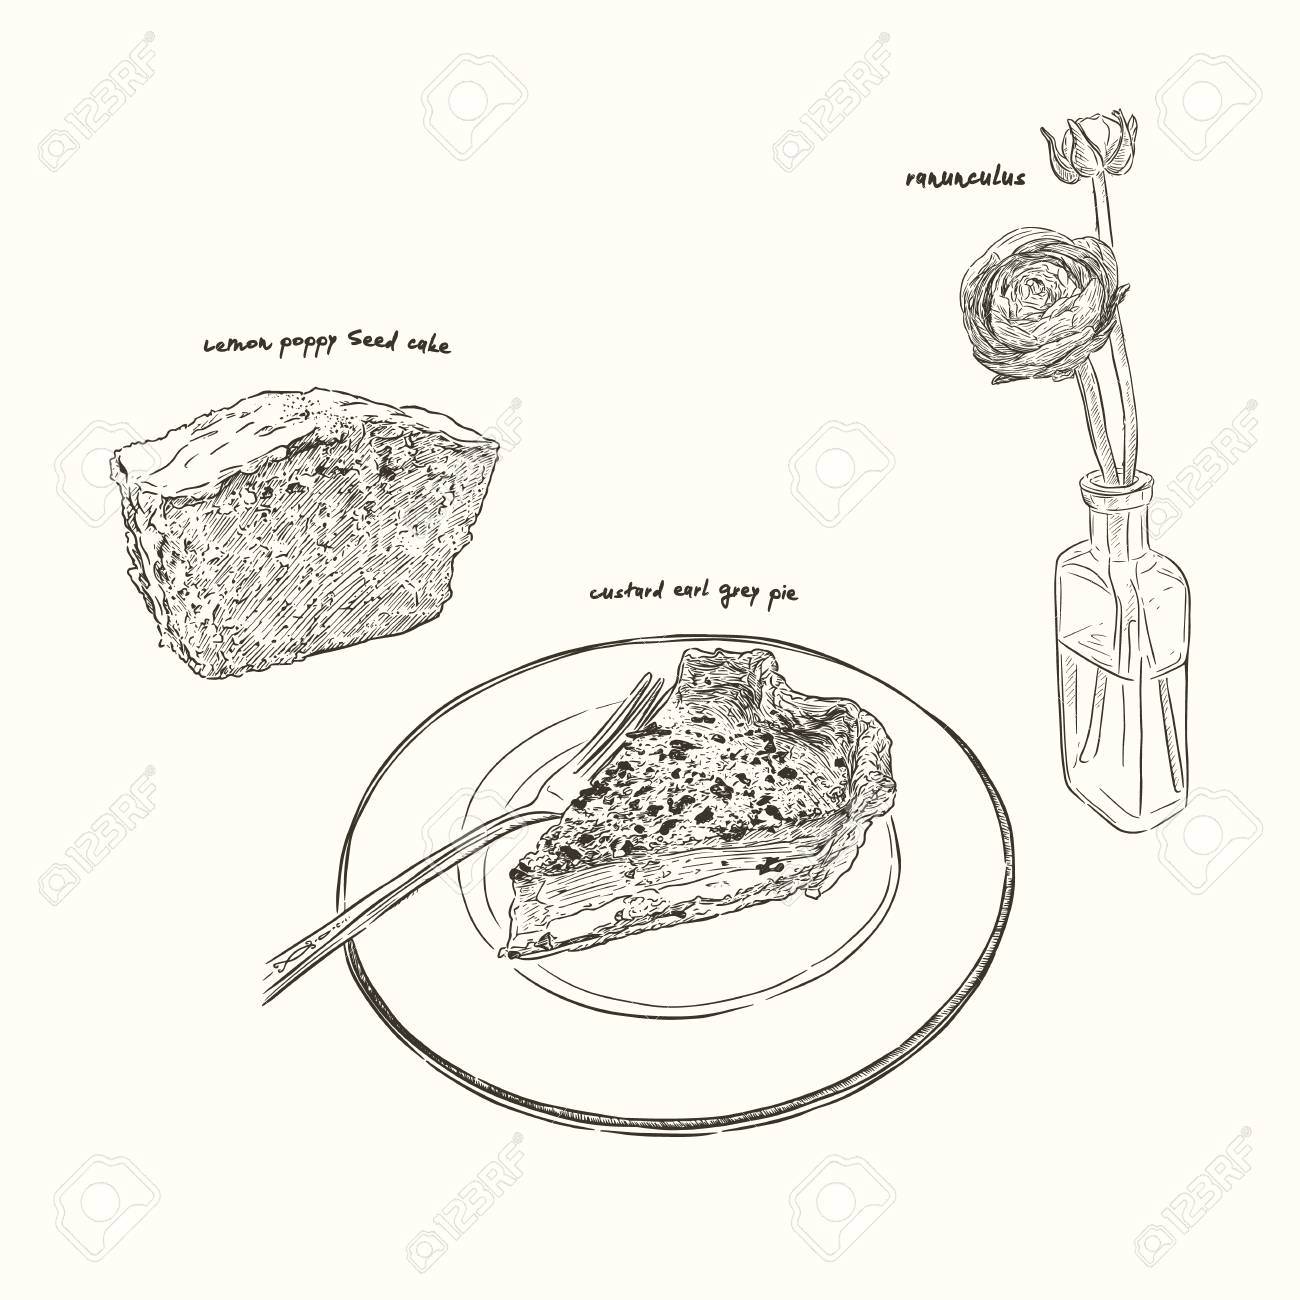 Slice Of Lemon Cake And Custard Earl Grey Pie With Yellow Ranunculus